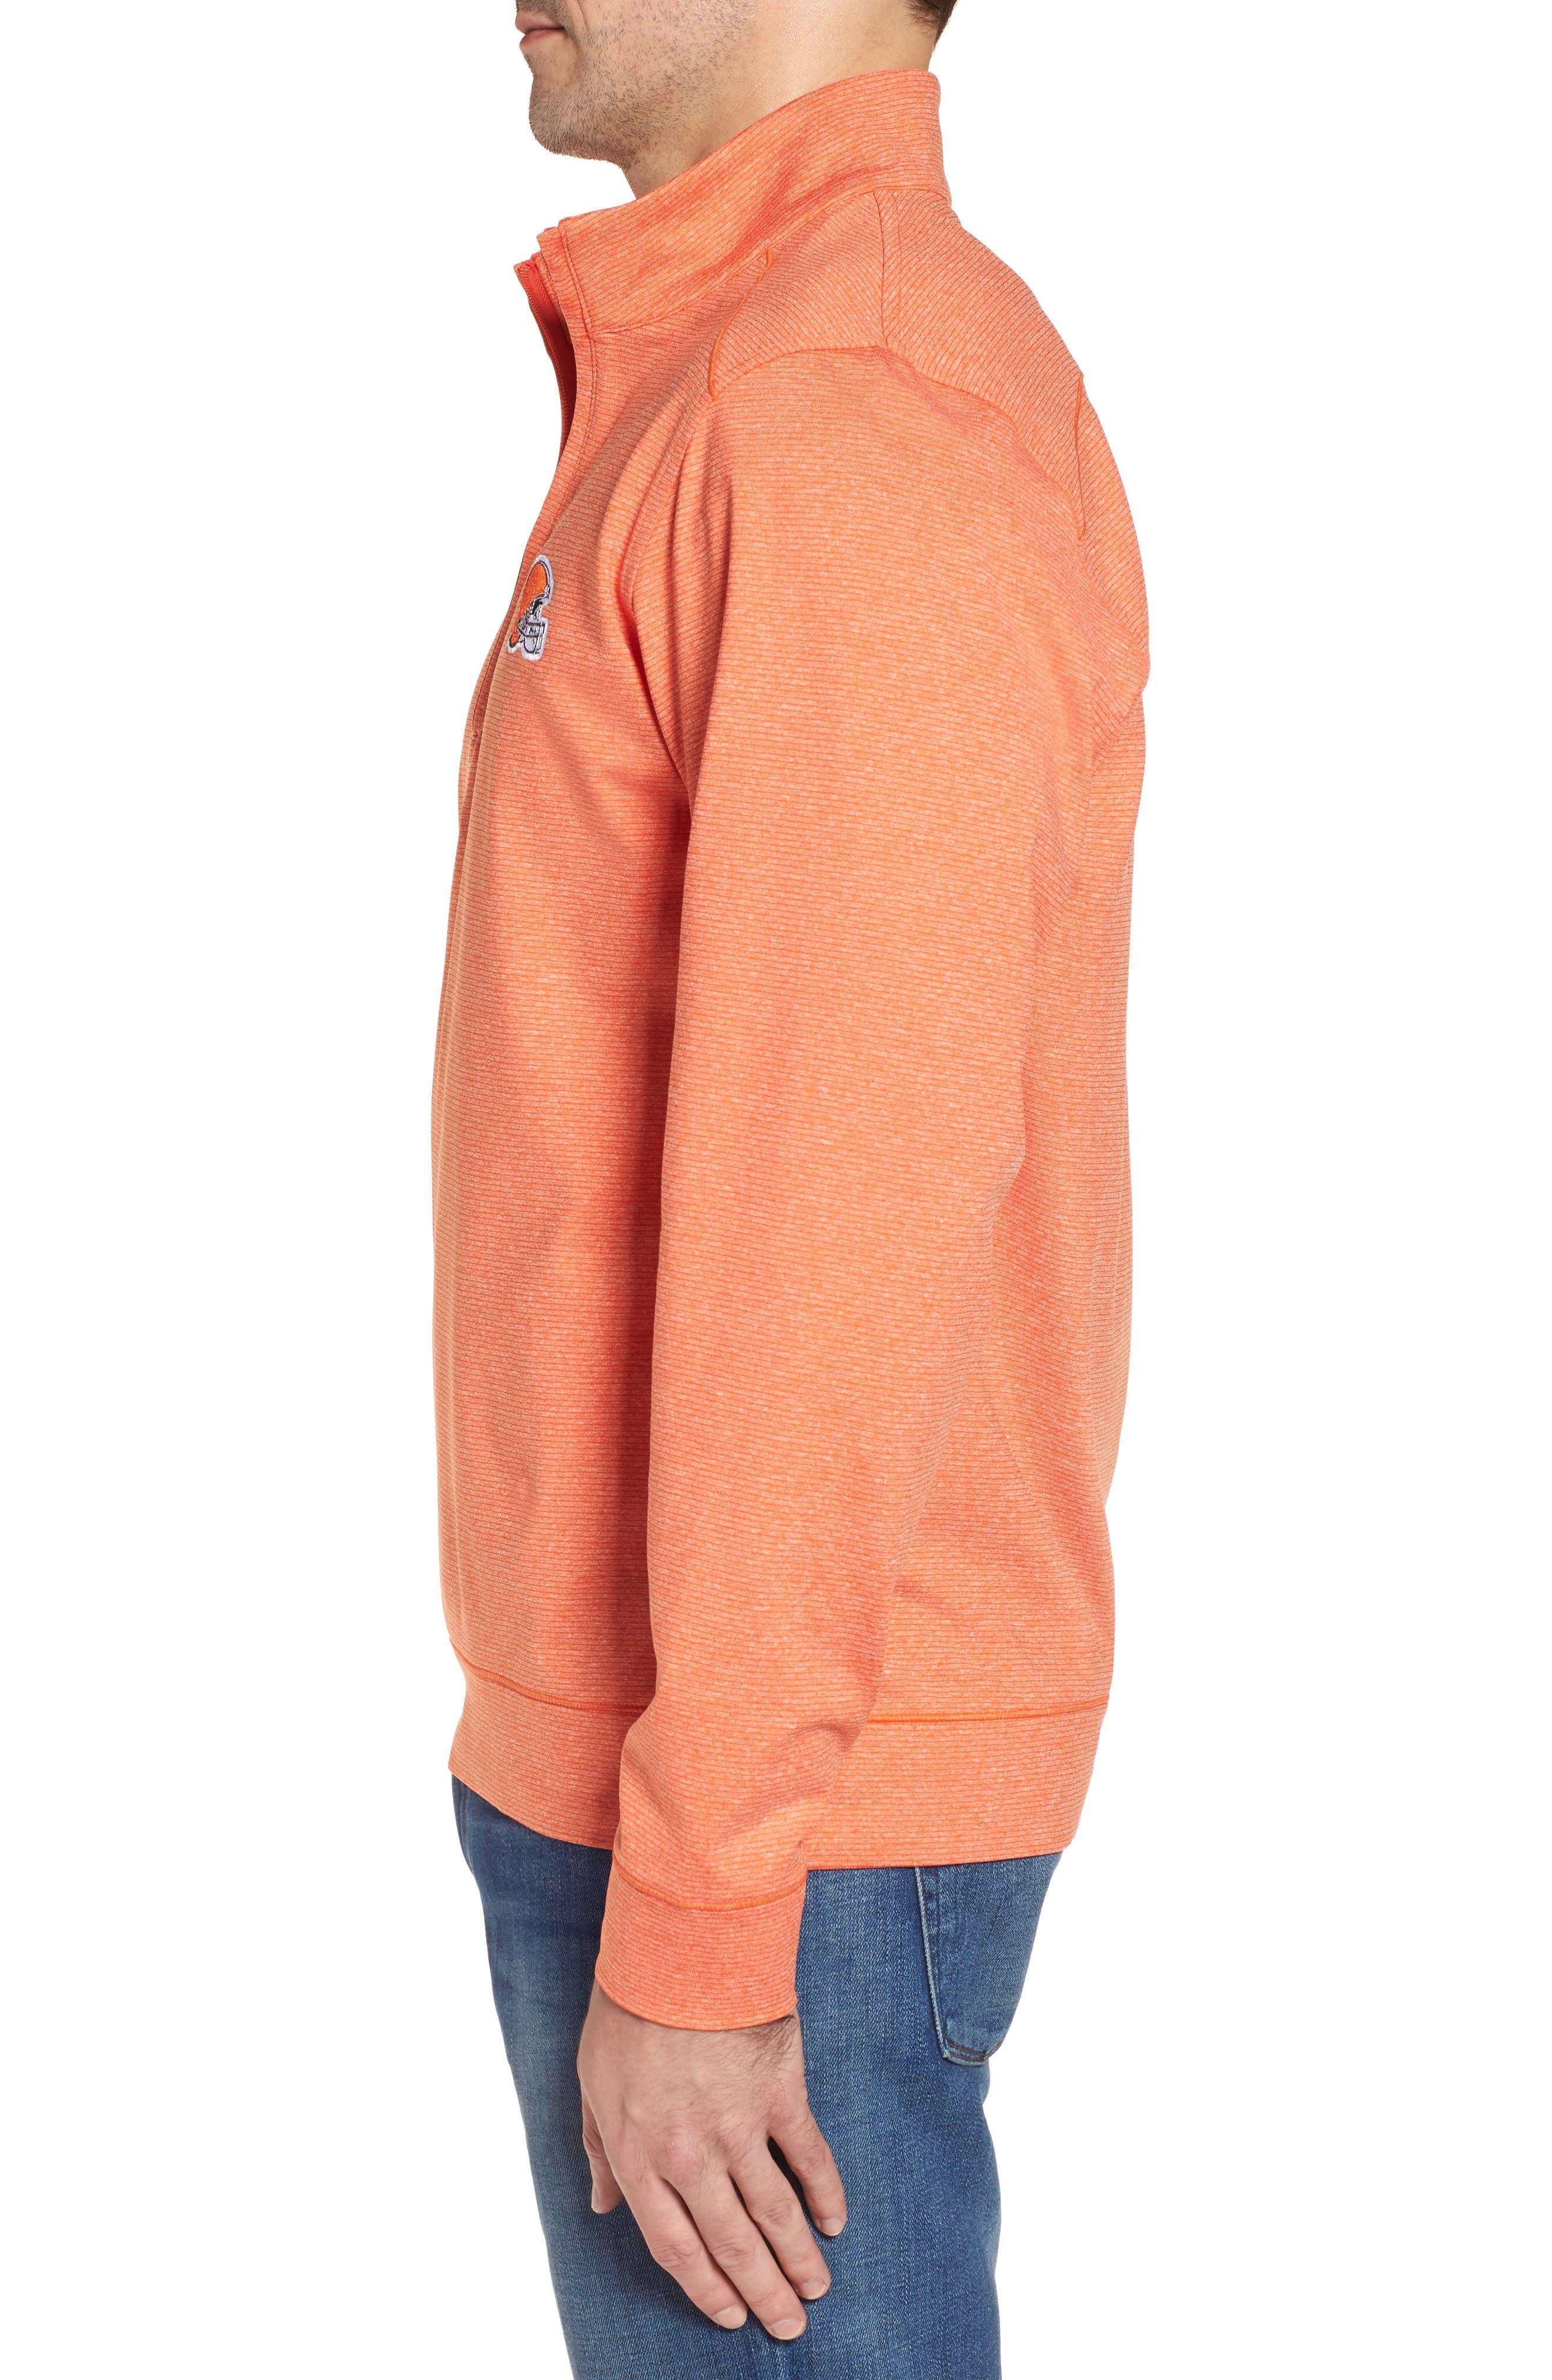 Shoreline - Cleveland Browns Half Zip Pullover,                             Alternate thumbnail 2, color,                             College Orange Heather